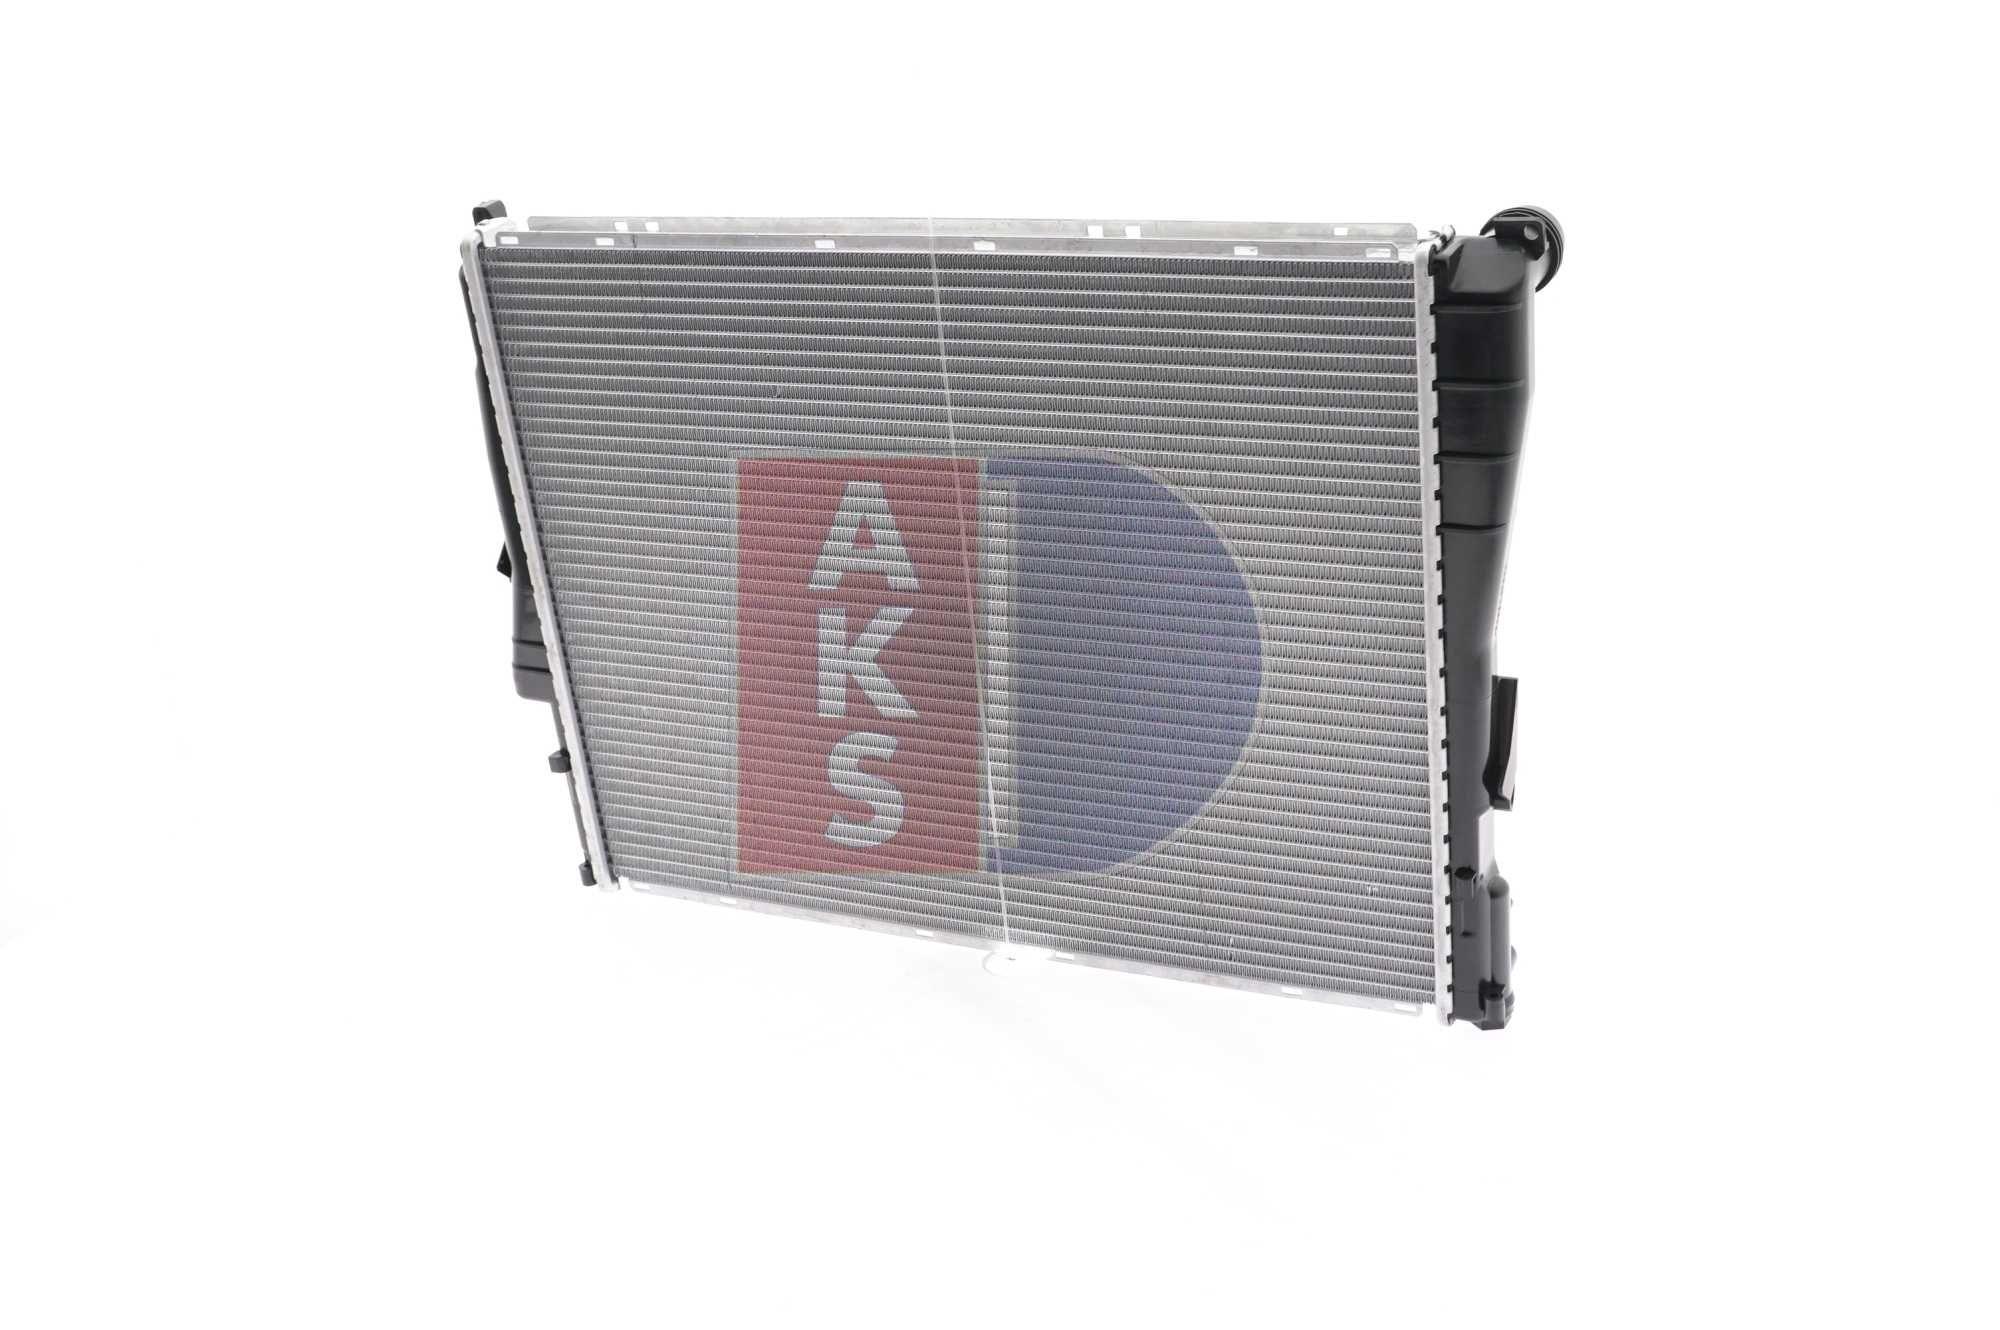 050004N Wasserkühler AKS DASIS 050004N - Große Auswahl - stark reduziert